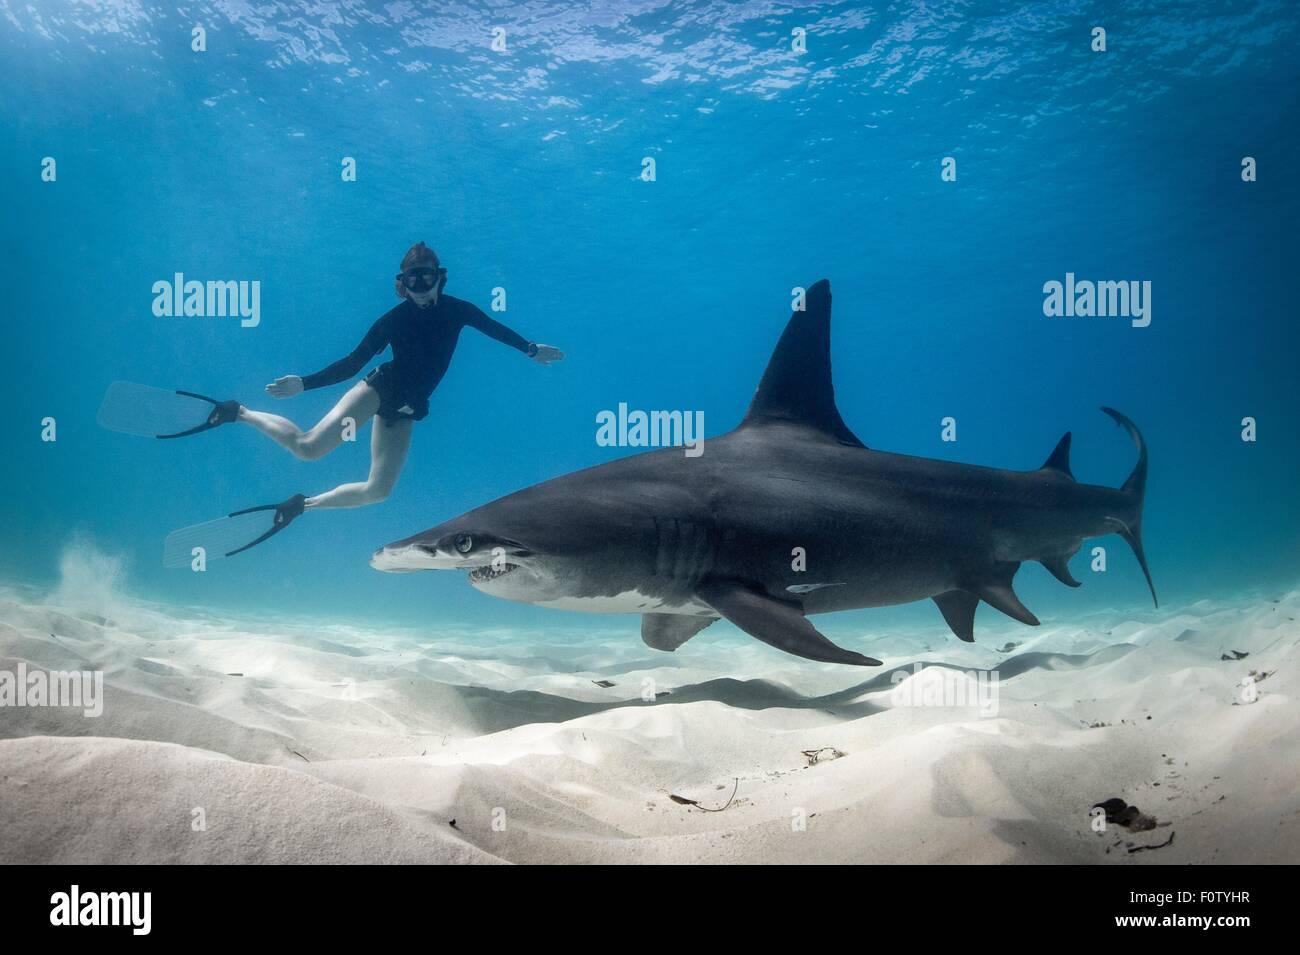 Woman free diving with Hammerhead shark, Bimini, Bahamas - Stock Image